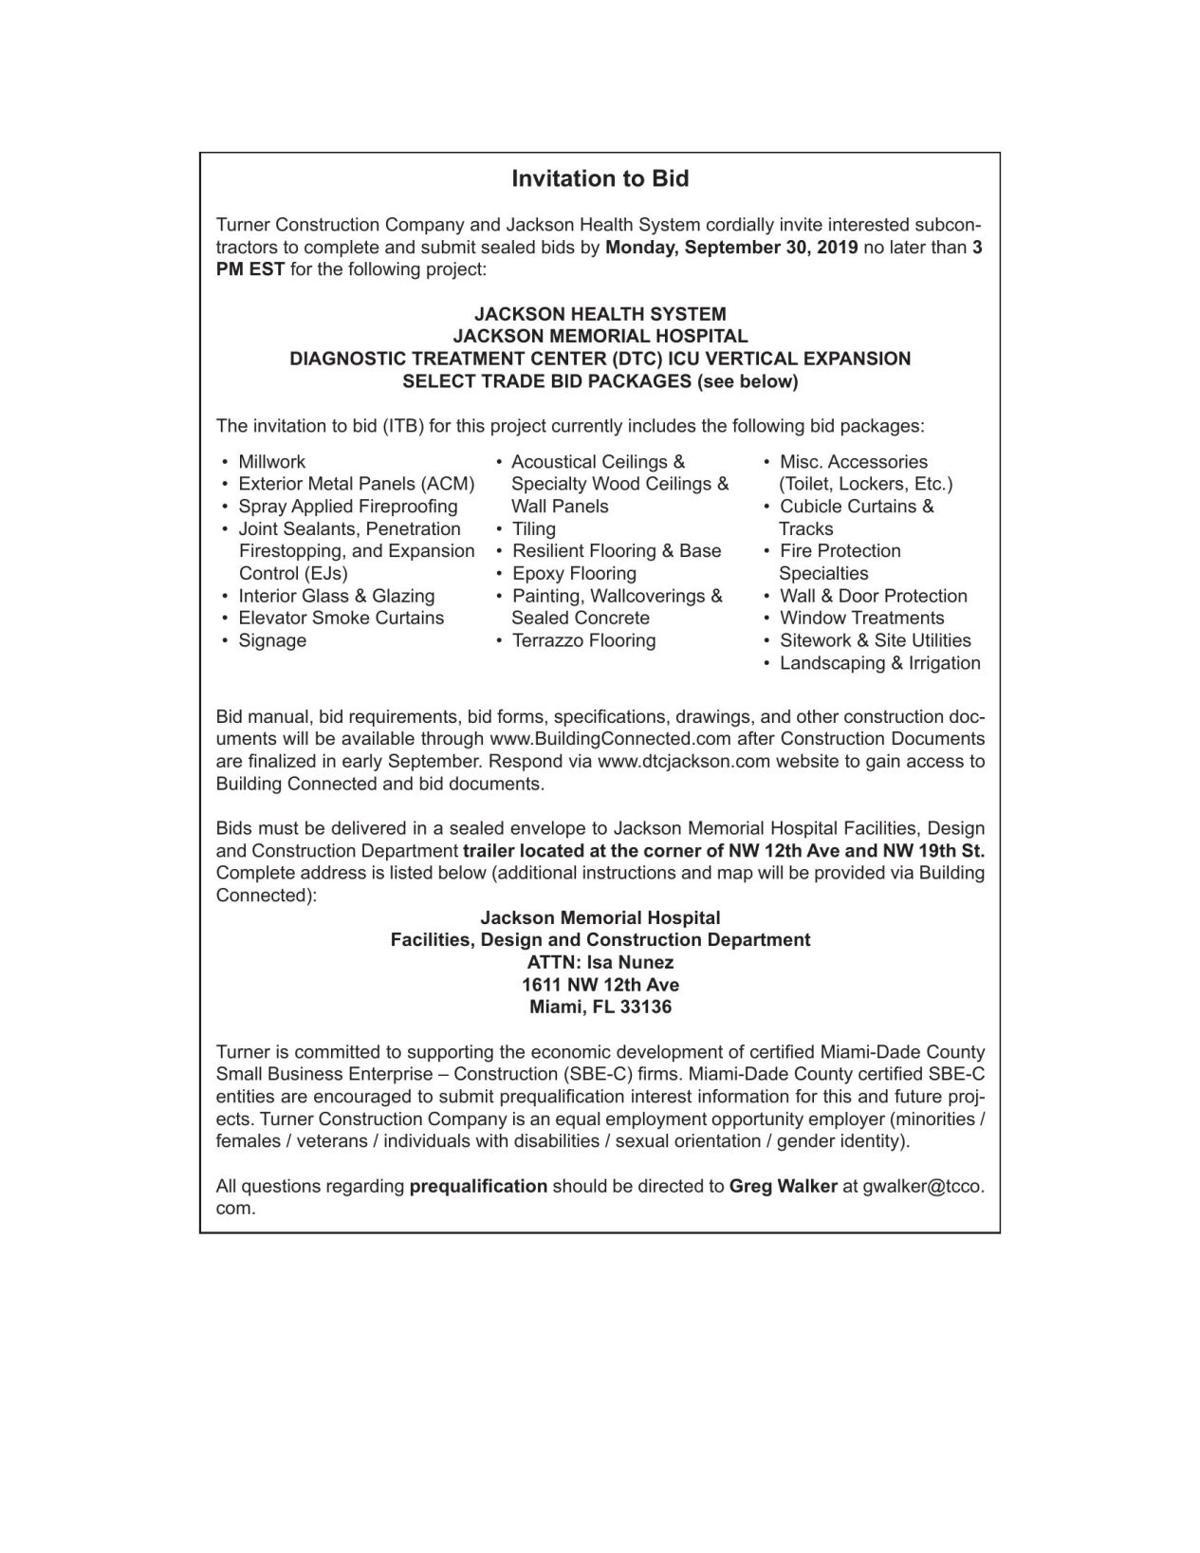 Legal Announcements Miamitimesonline